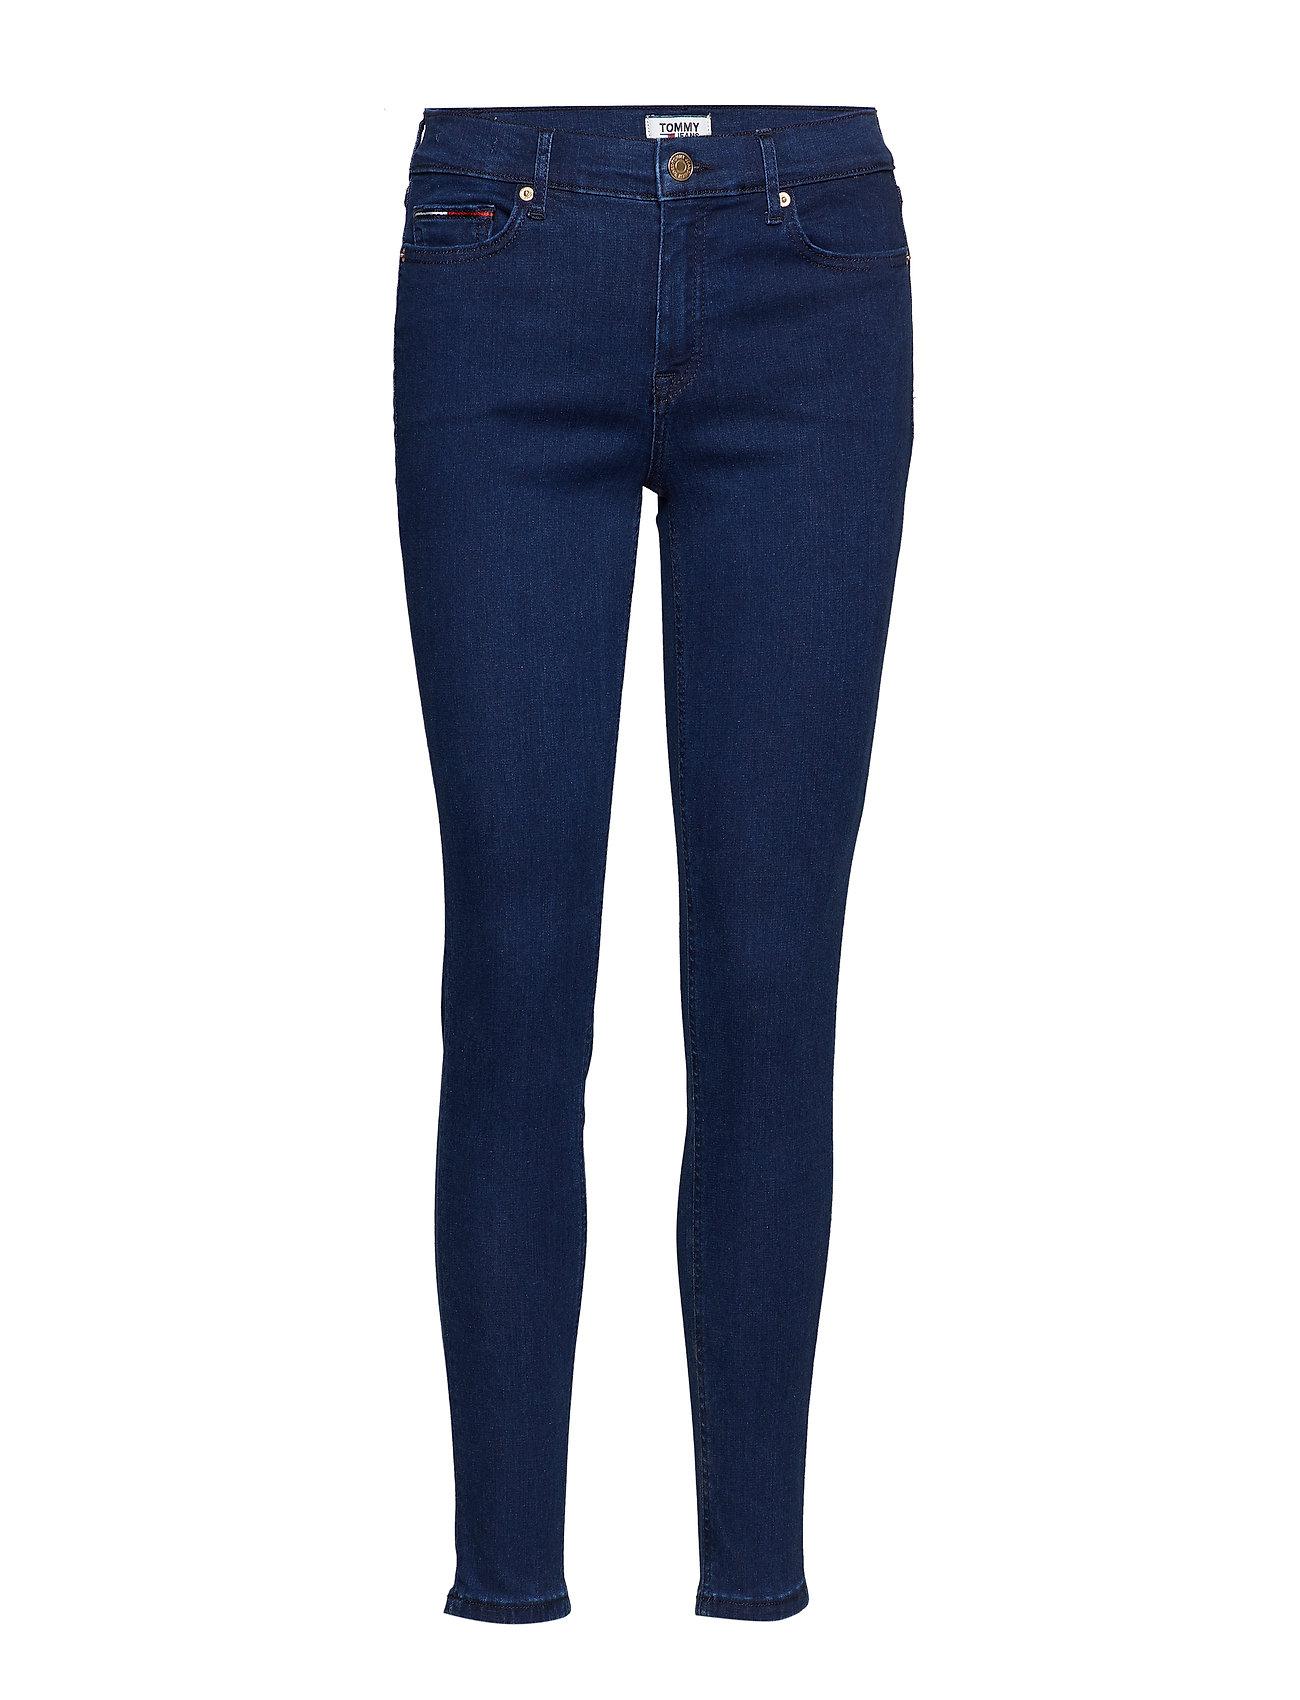 StrTommy Mid Skinny Dk Jeans Blue Rise Noraplush yvm8PN0nwO